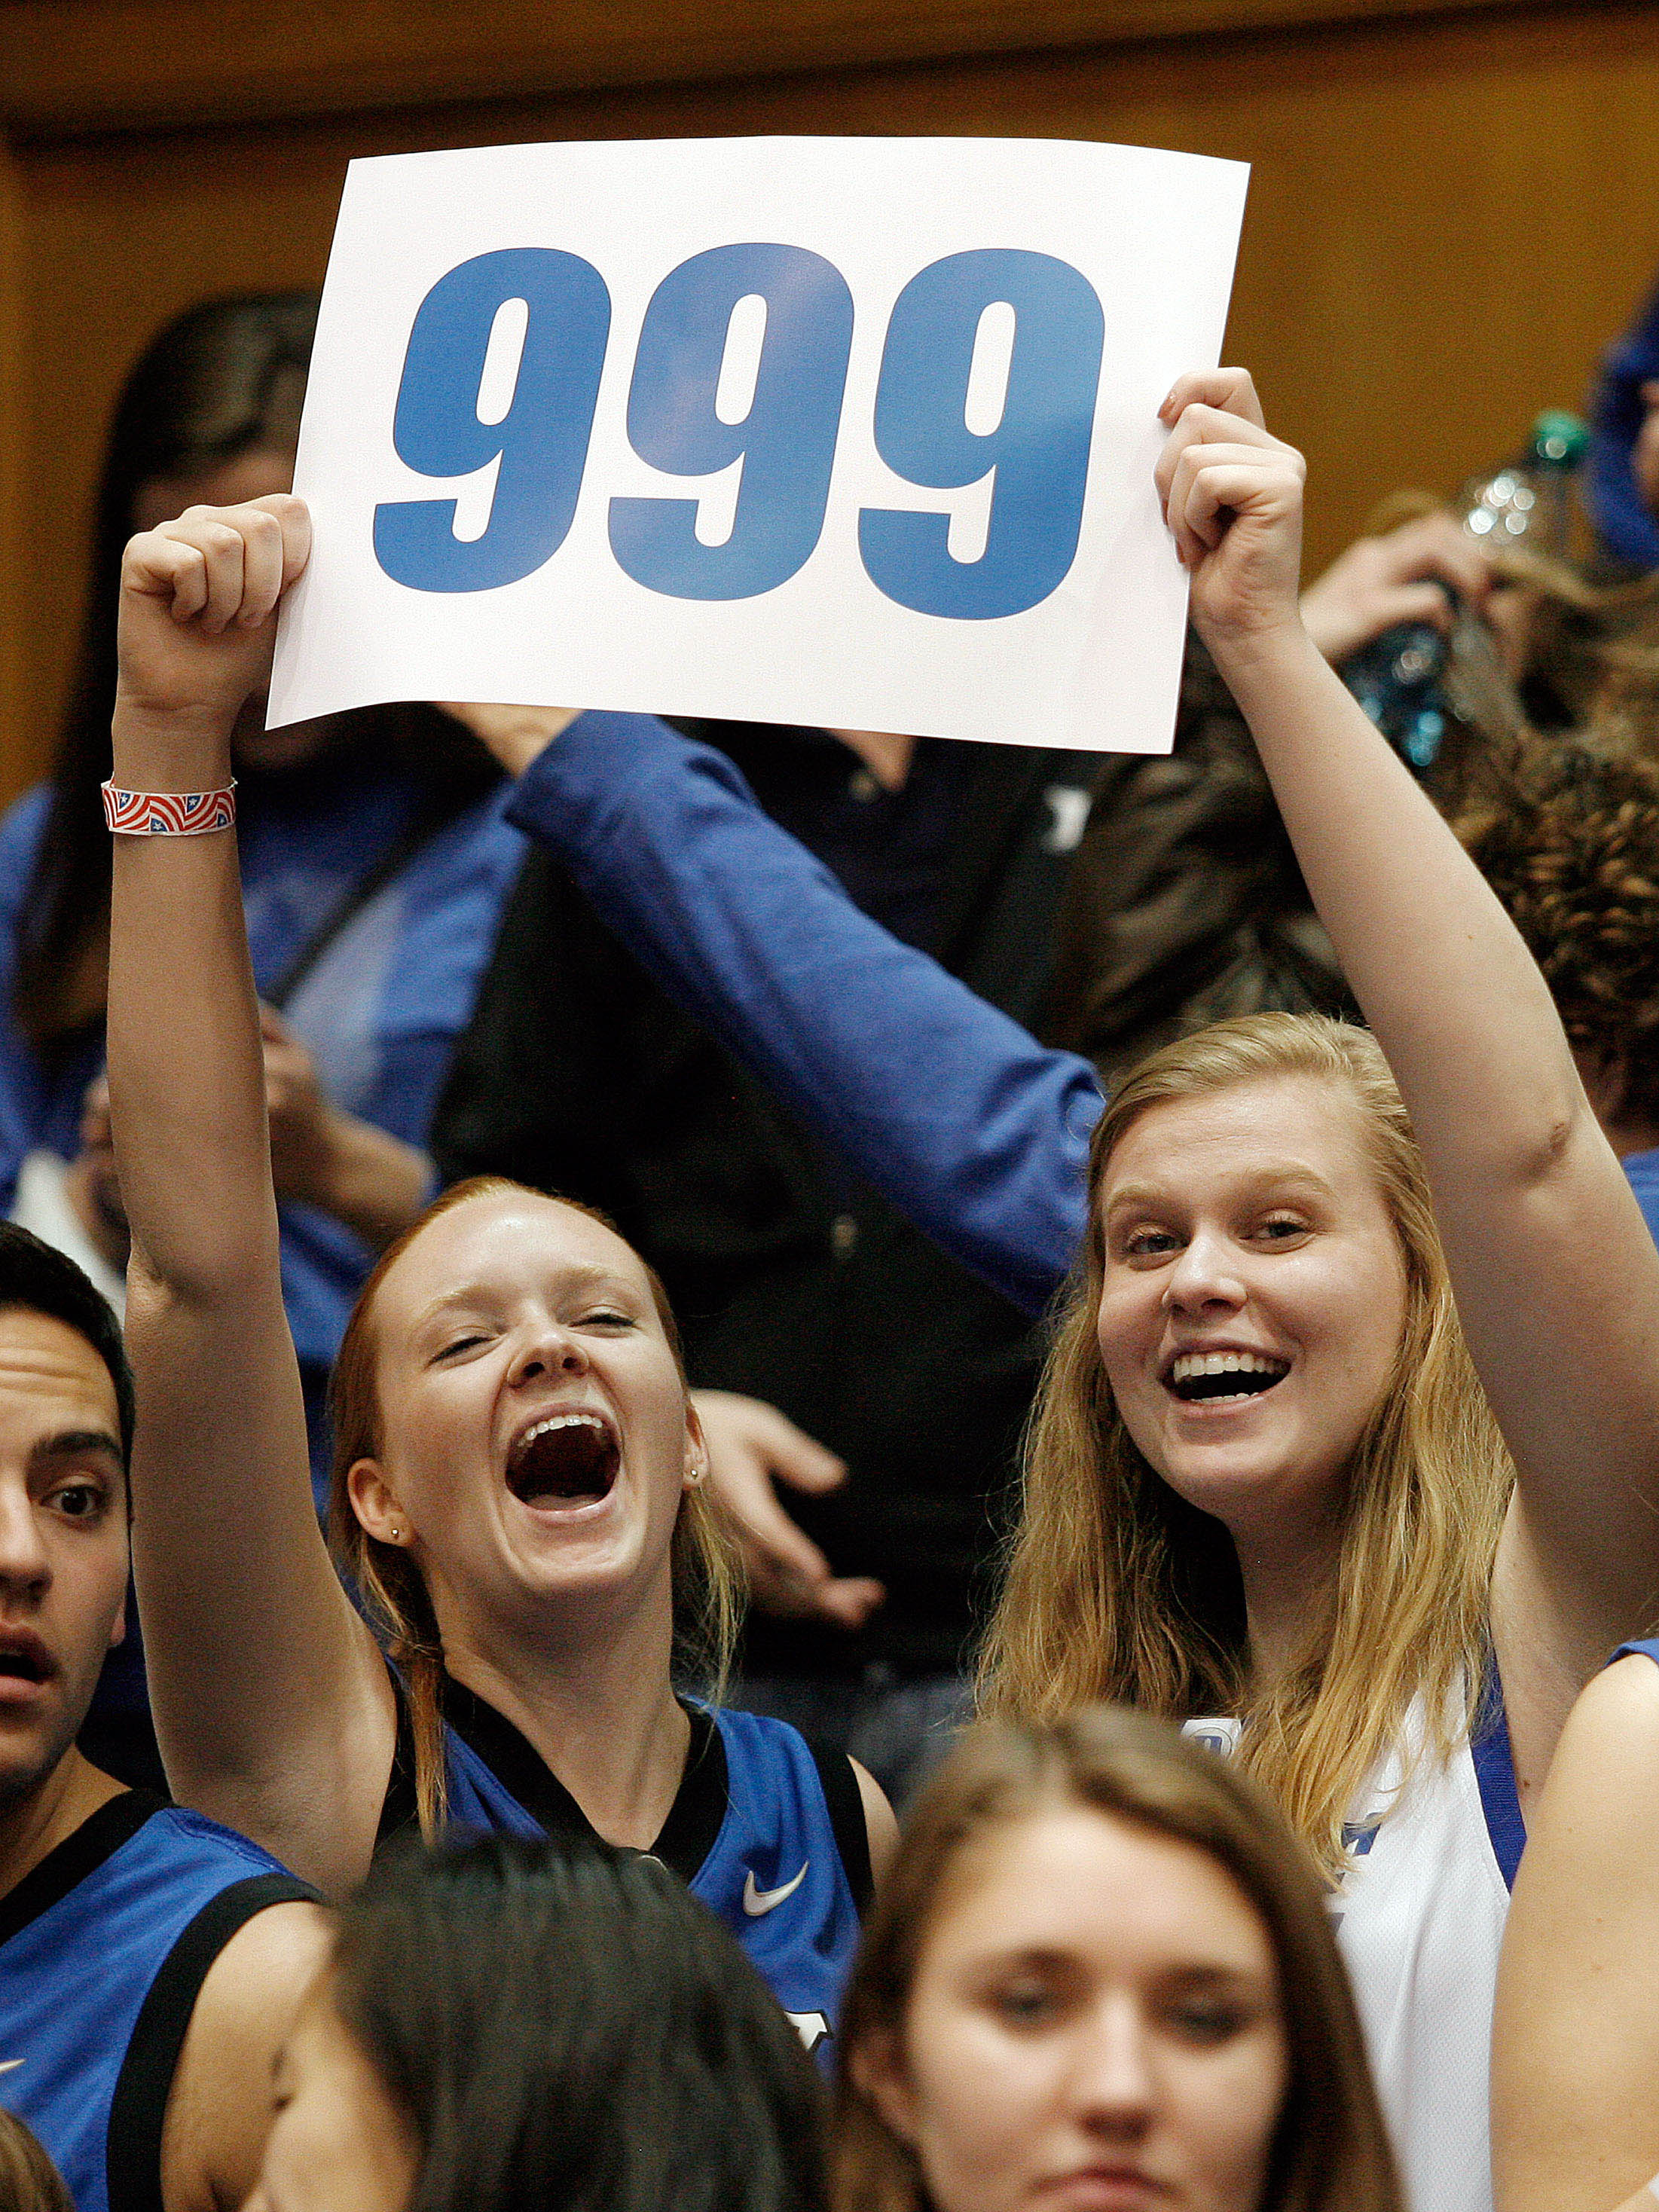 Duke fans celebrate their 79-65 win over Pitt, marking Mike Krzyzewski's 999th career win. (USA TODAY Sports)